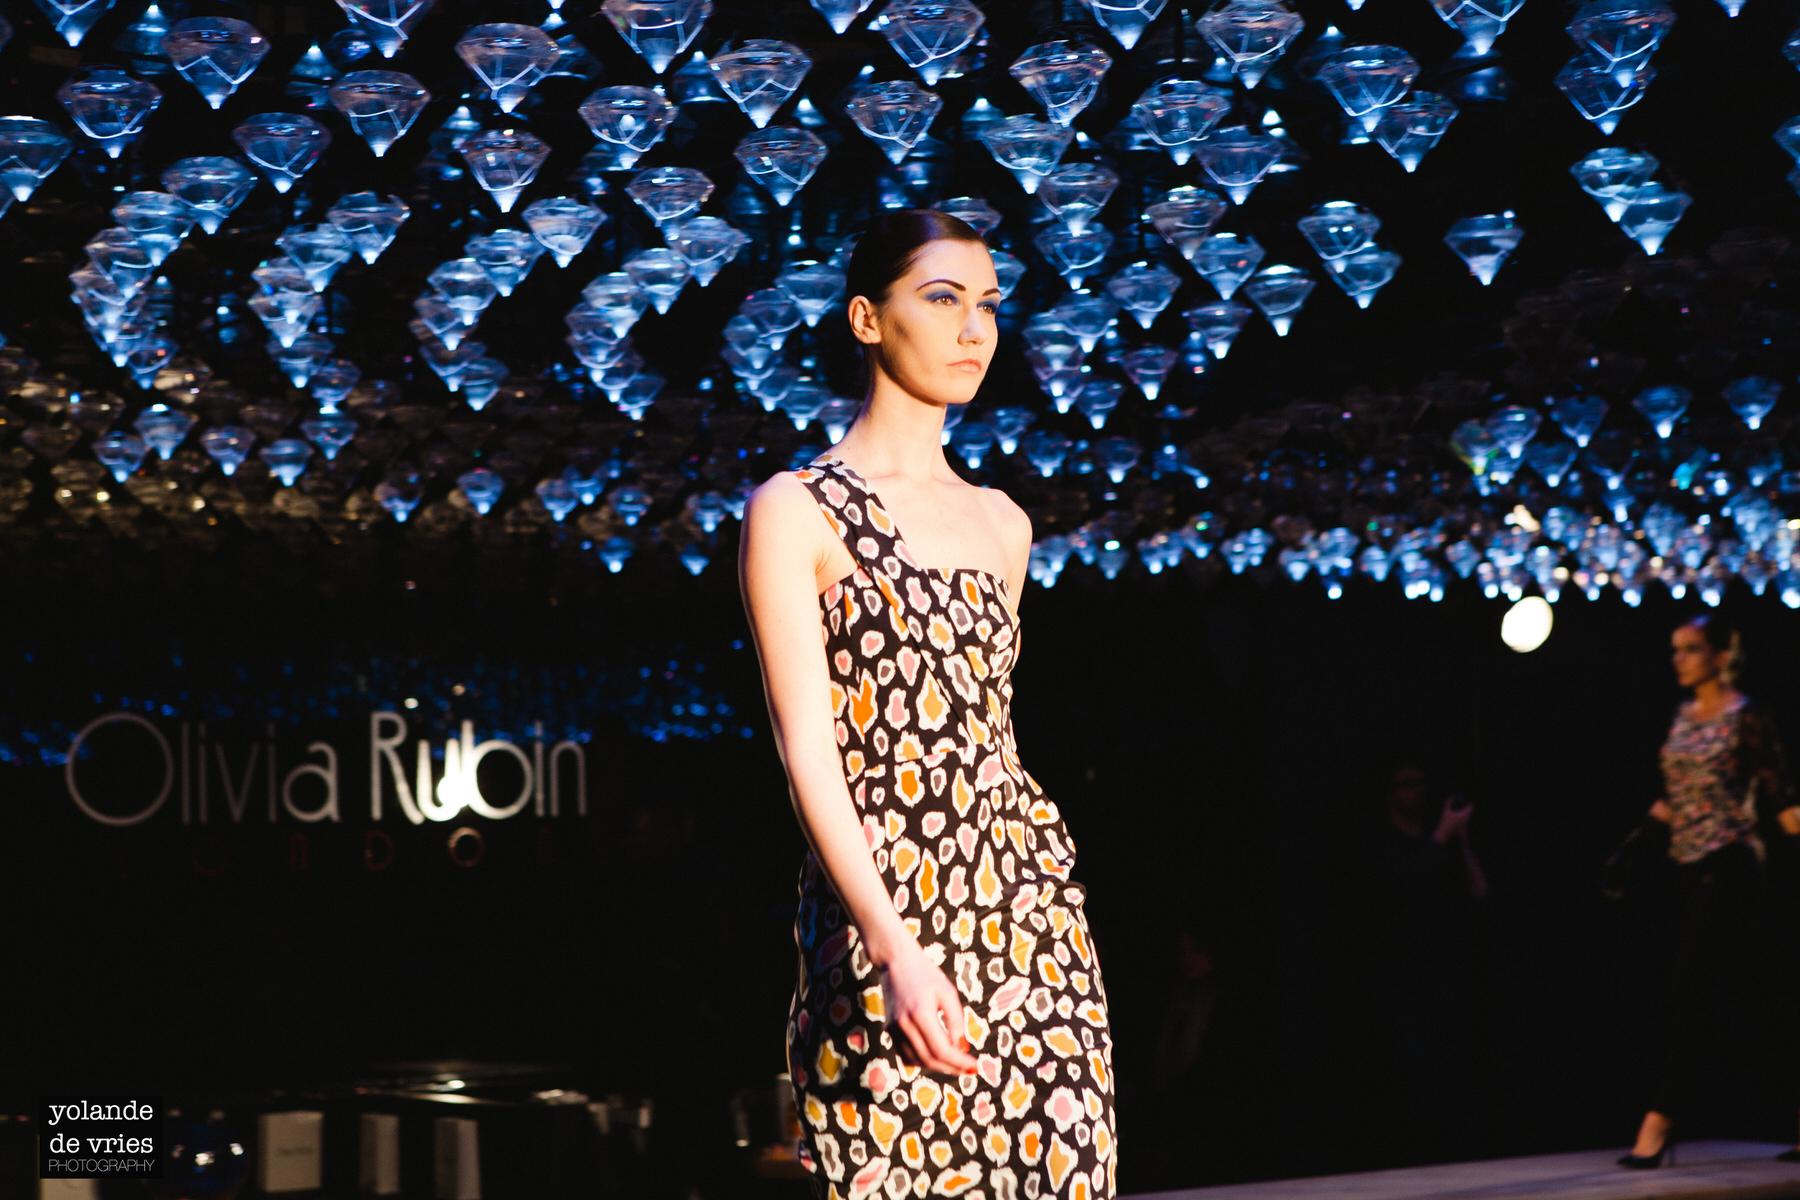 Olivia-Rubin-SS11-London-Fashion-Week-1483.jpg